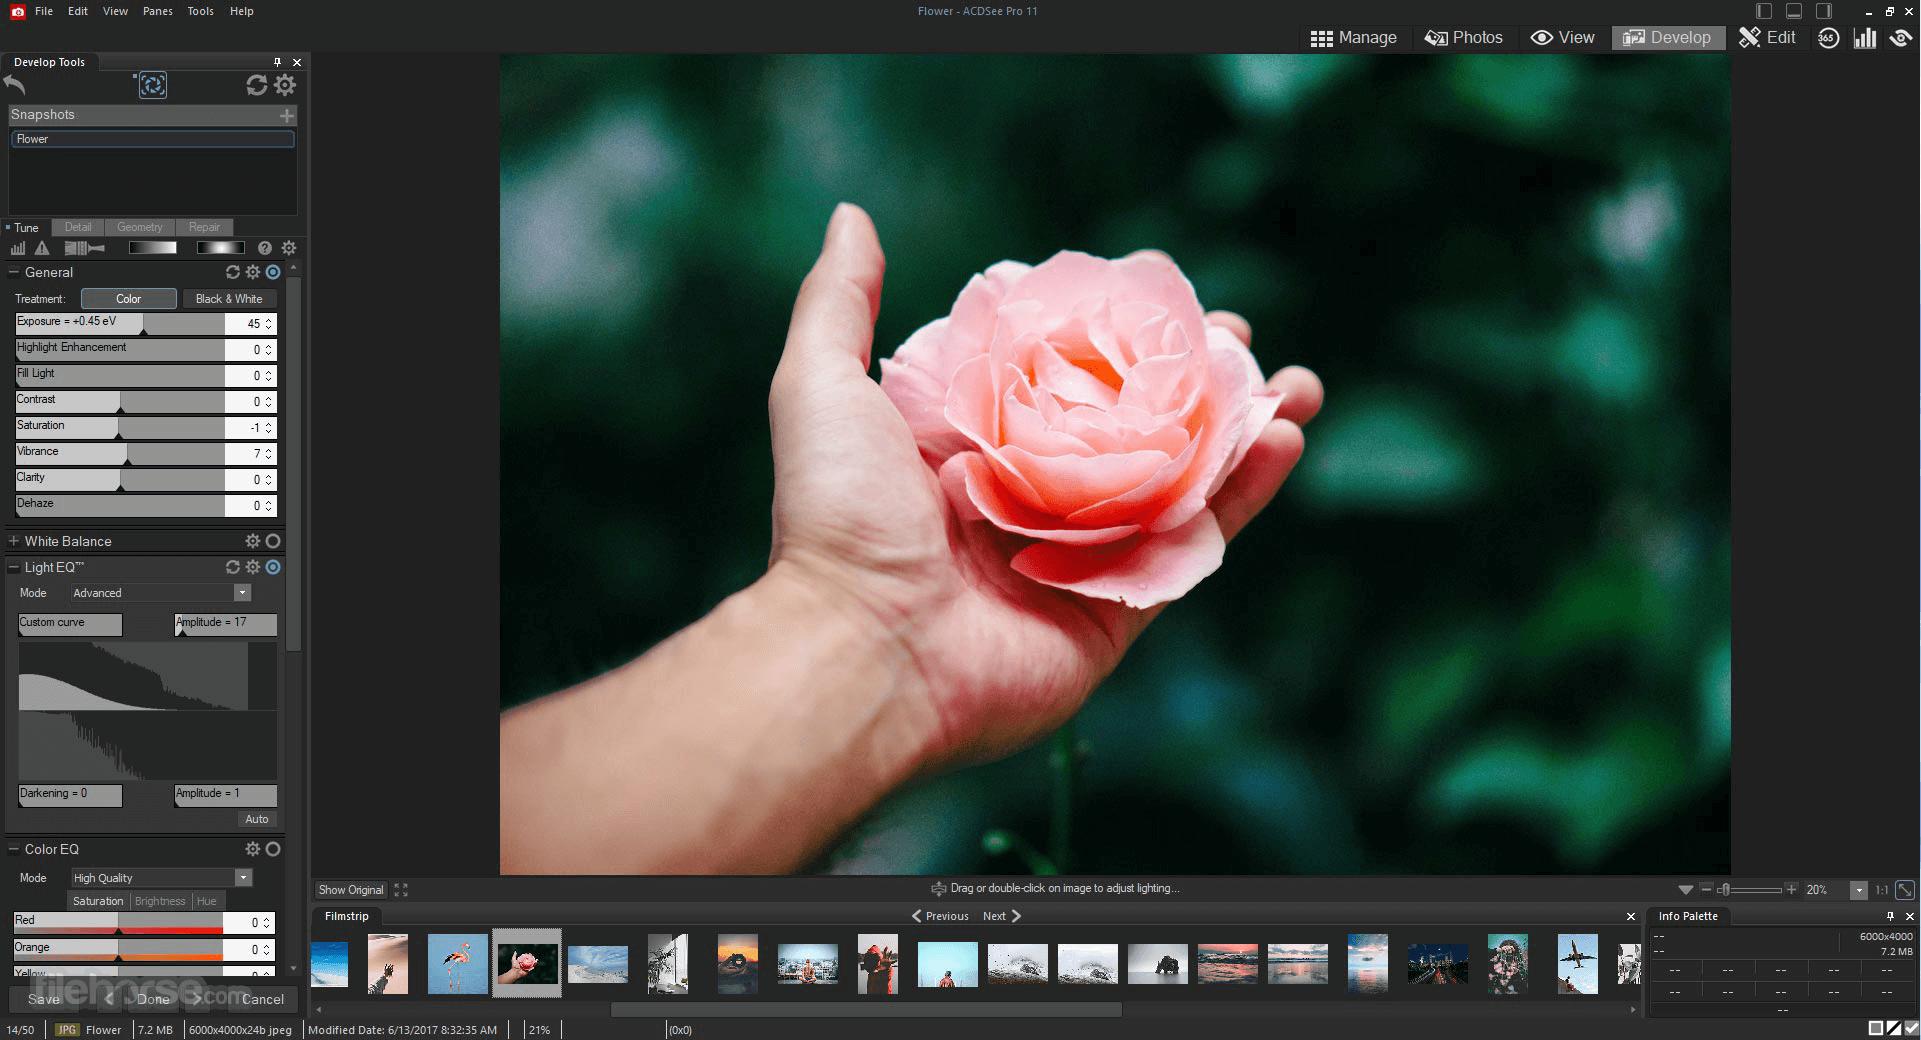 تحميل برنامج تعديل الصور 2019 ACDSee Photo Studio Professional للكمبيوتر acdsee-photo-studio-